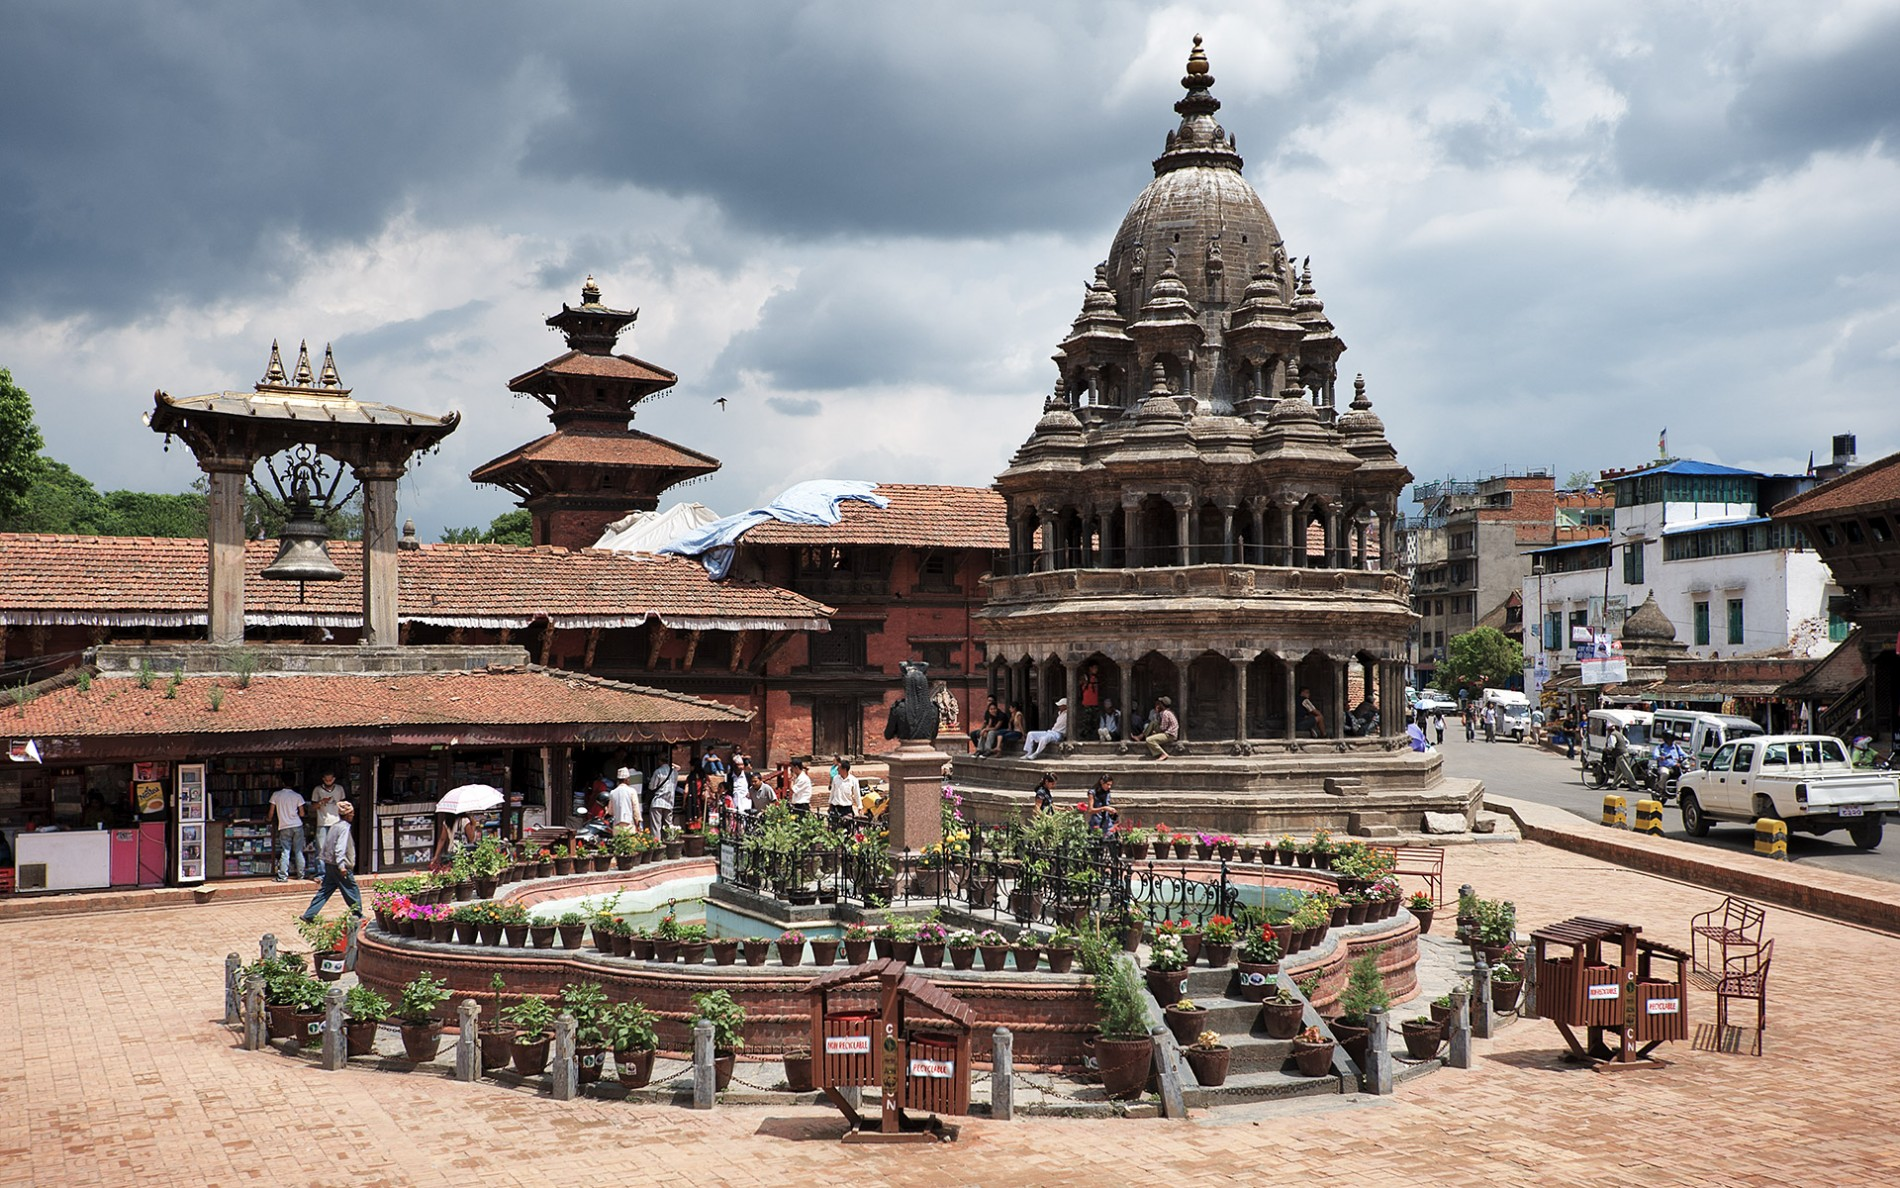 3. Patan Museum Patan Durbar Square Patan